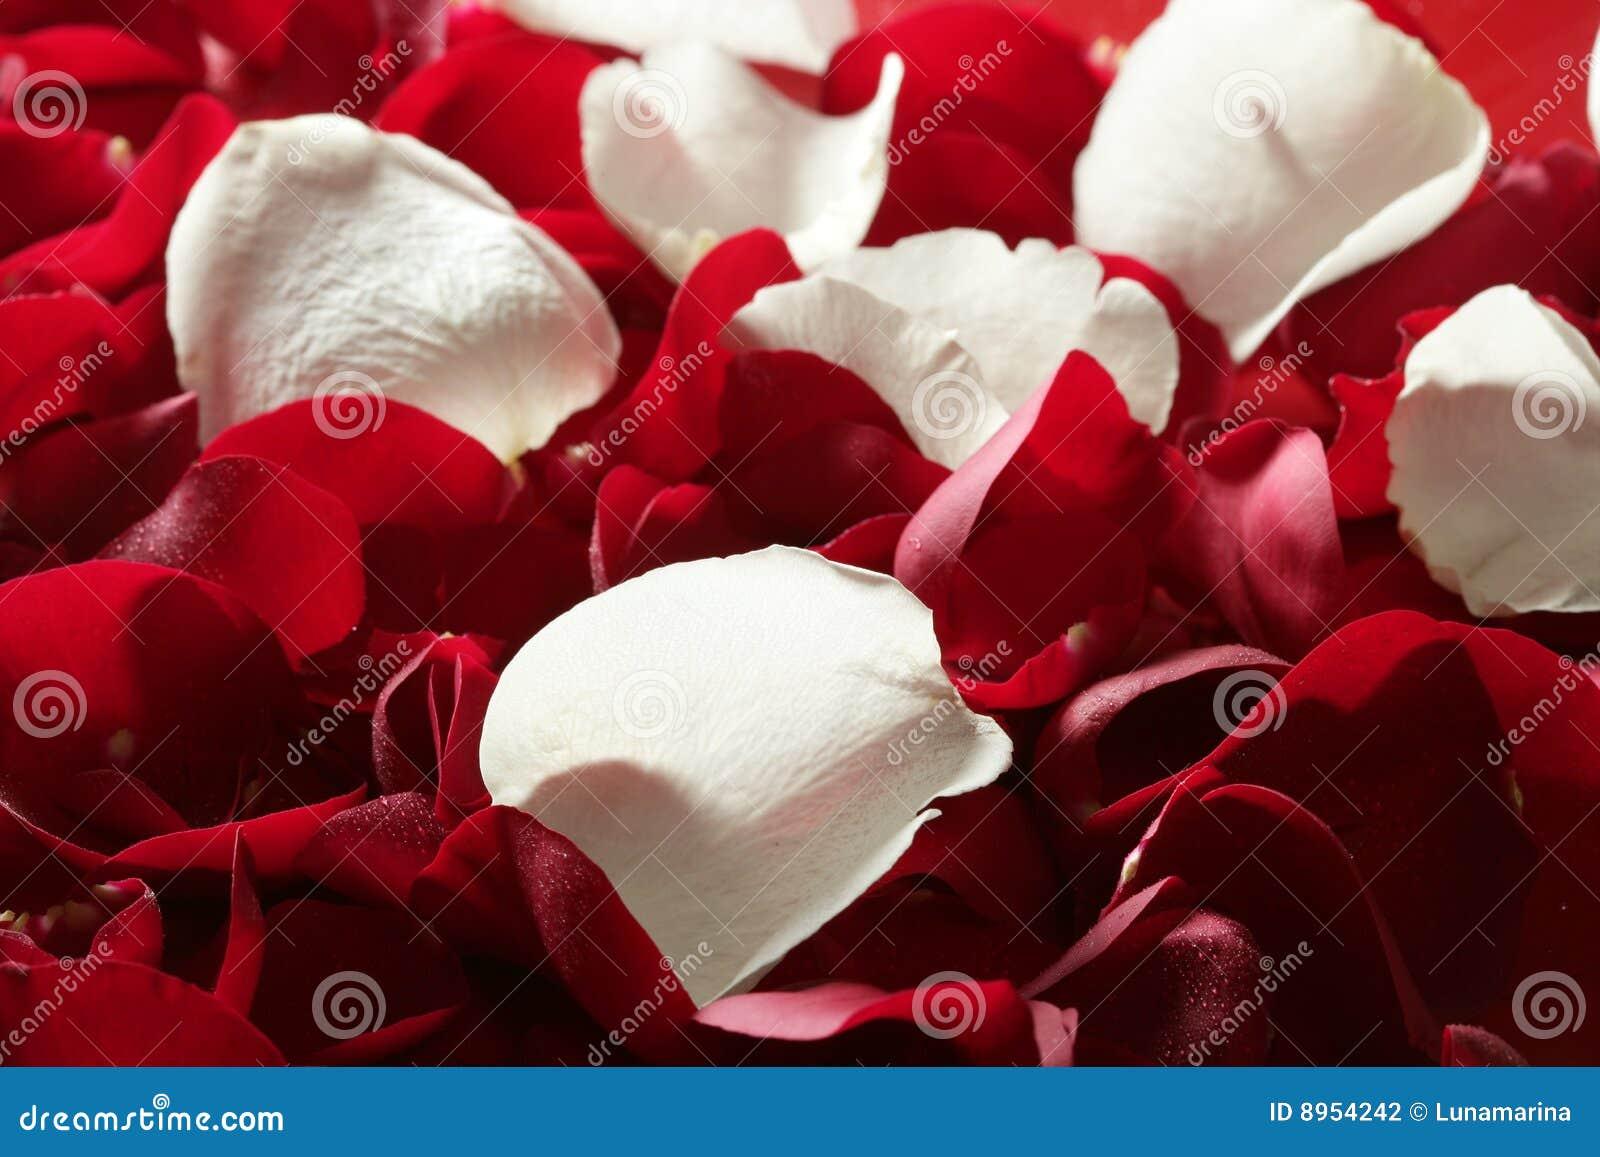 Colorful Rose Petal Pattern Wallpaper Texture Stock Photo